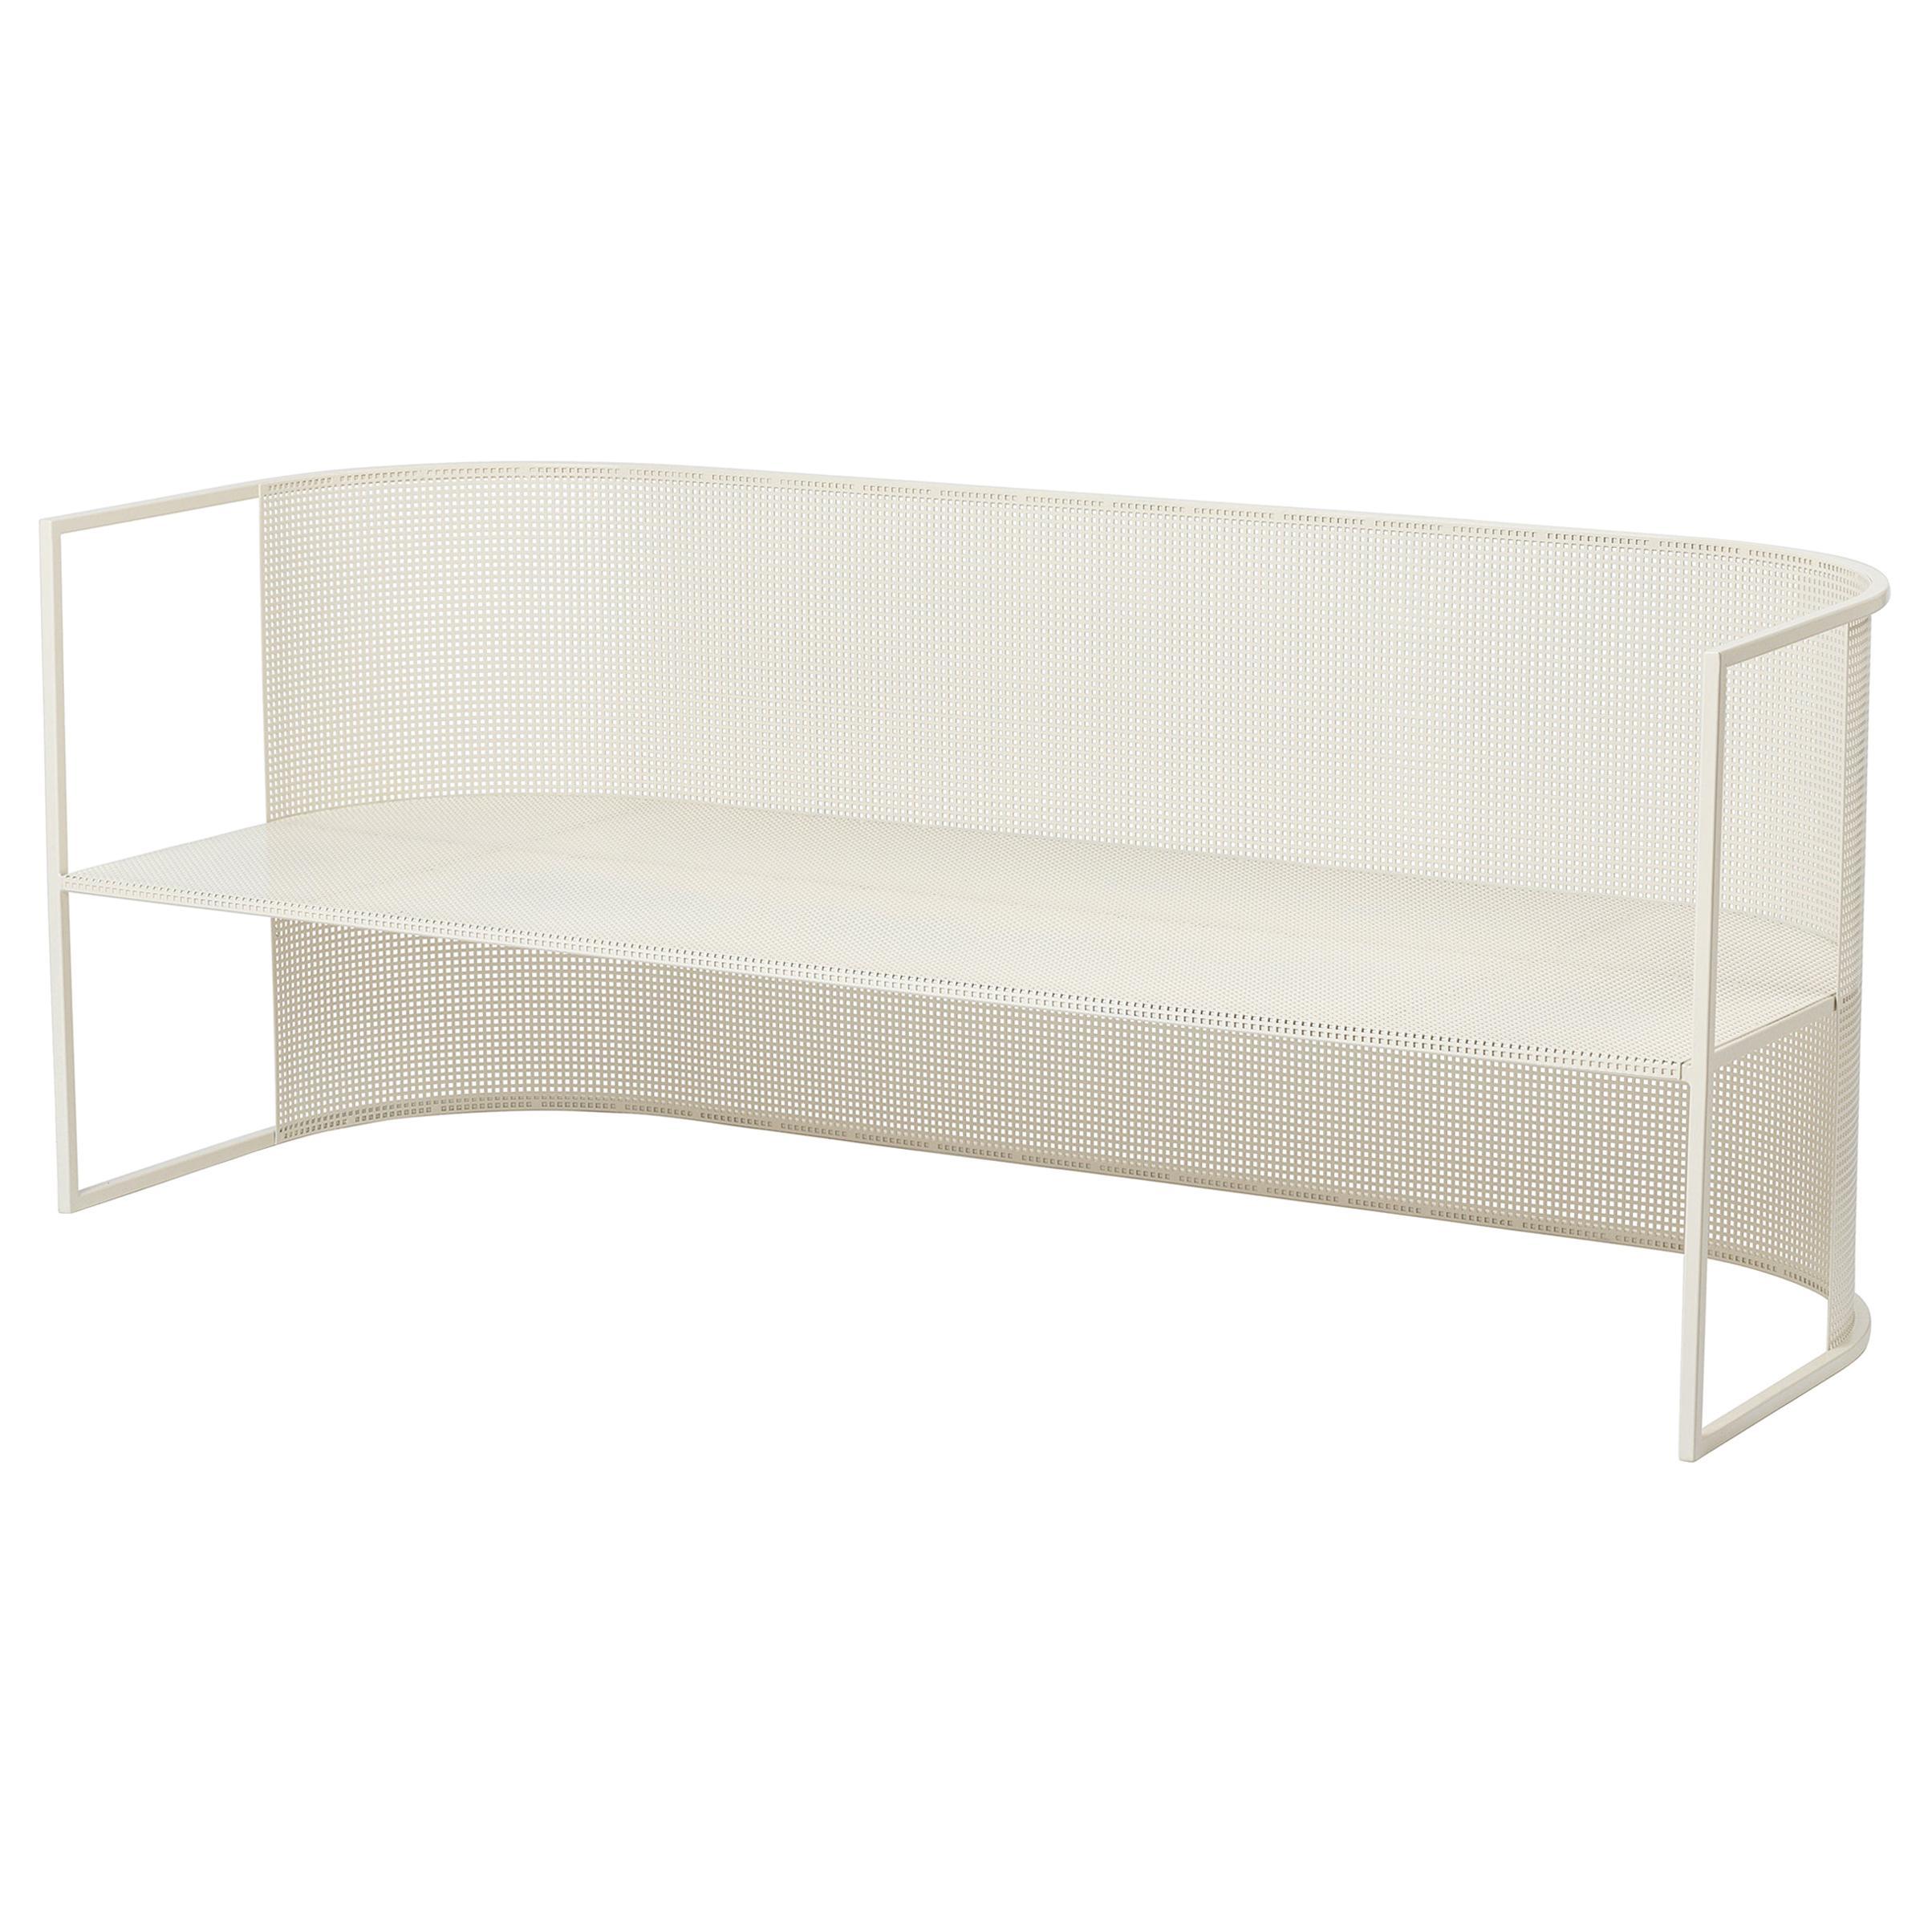 Steel Bahaus Lounge Bench by Kristina Dam Studio